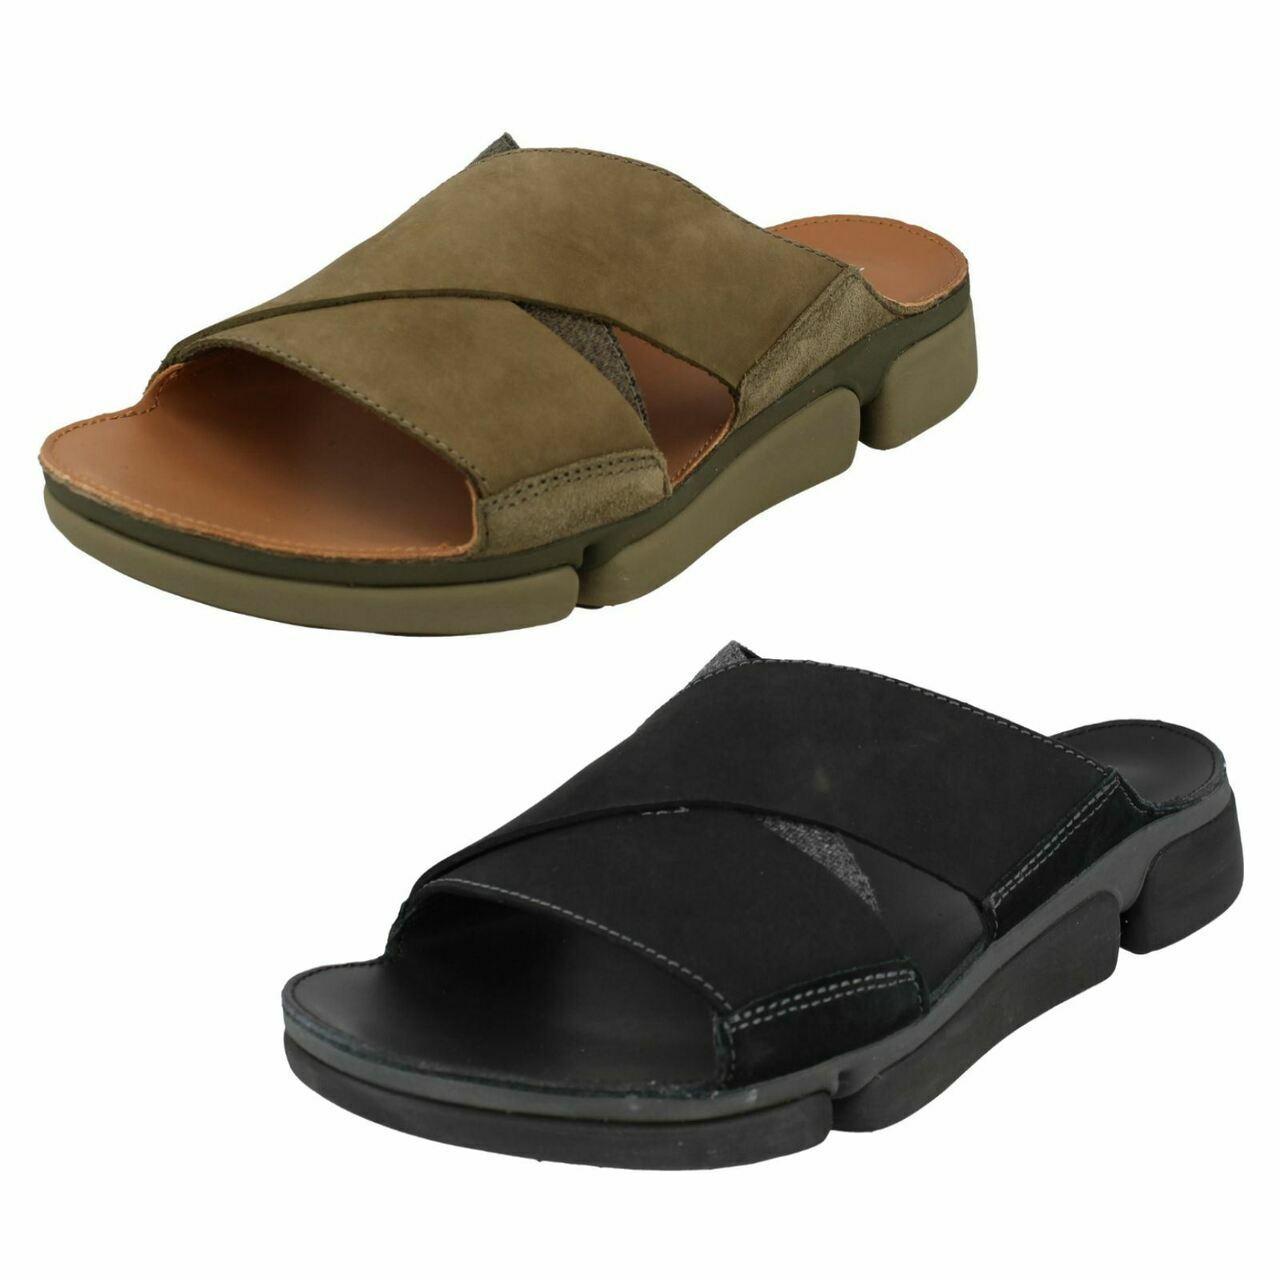 Clarks Mens Flip Flop Sandals TRI COVE CROSS Black / Olive Combination